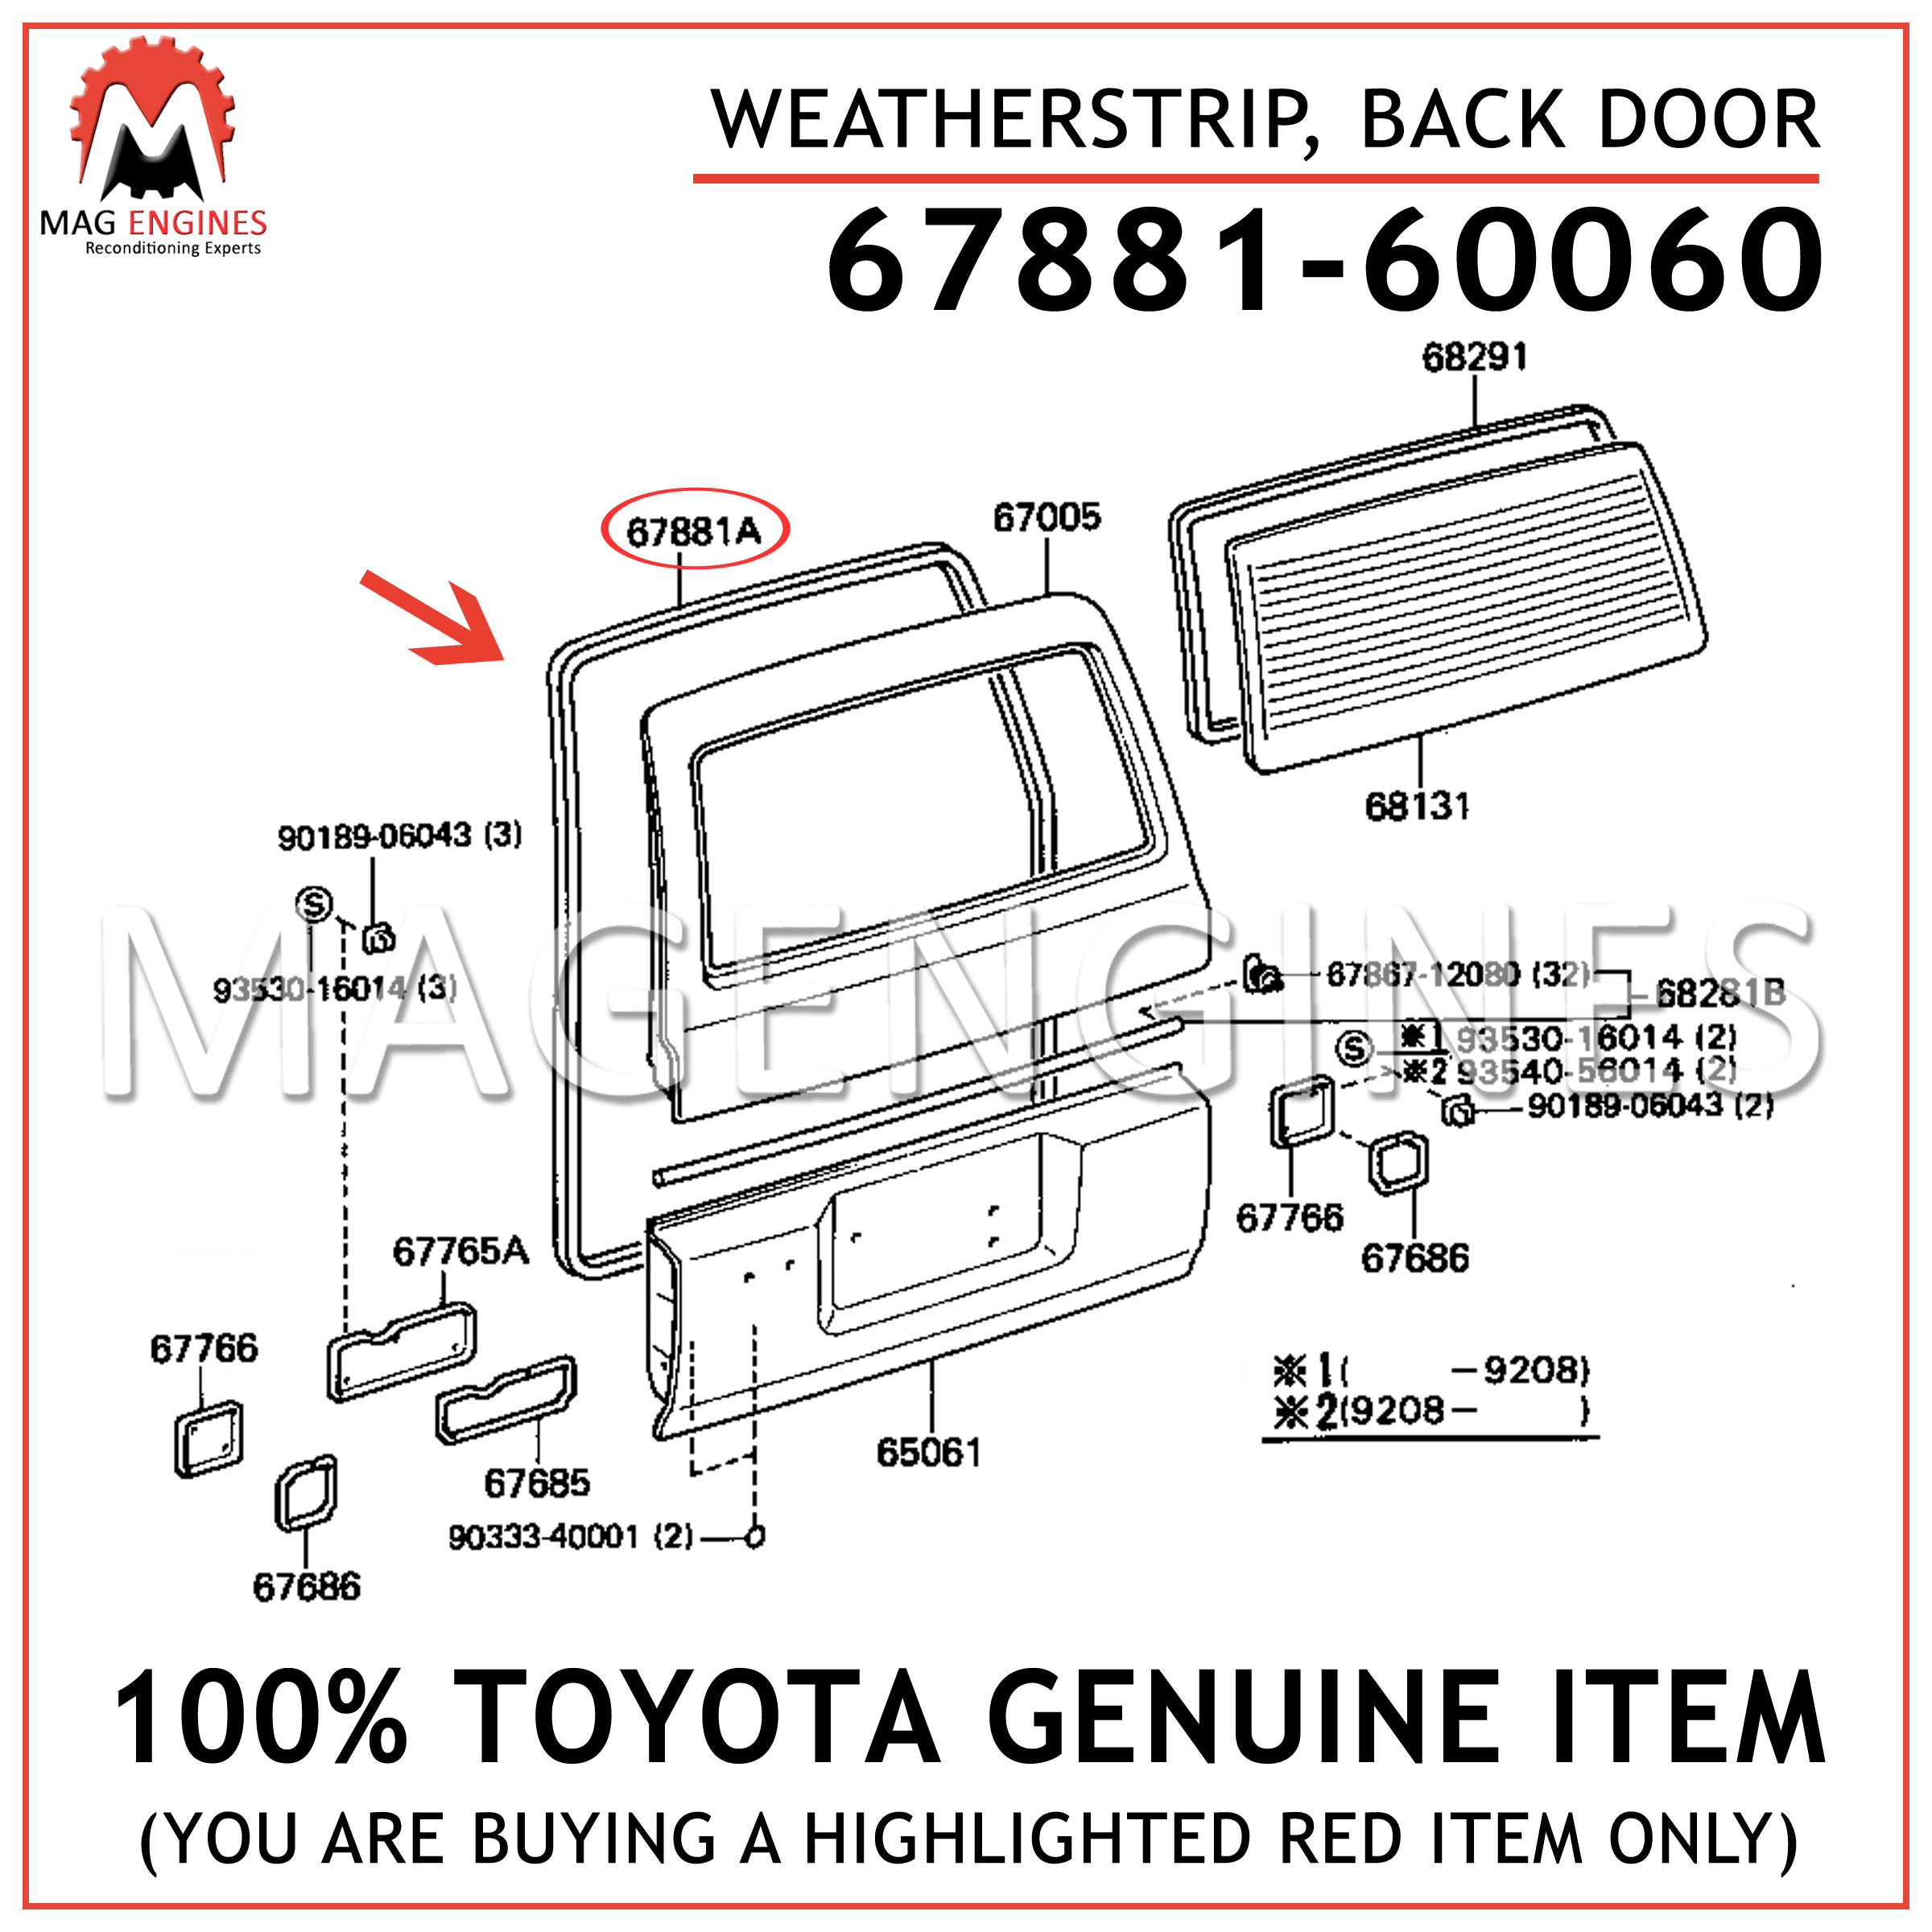 GENUINE Toyota 67881-60060 WEATHERSTRIP BACK DOOR 6788160060 OEM